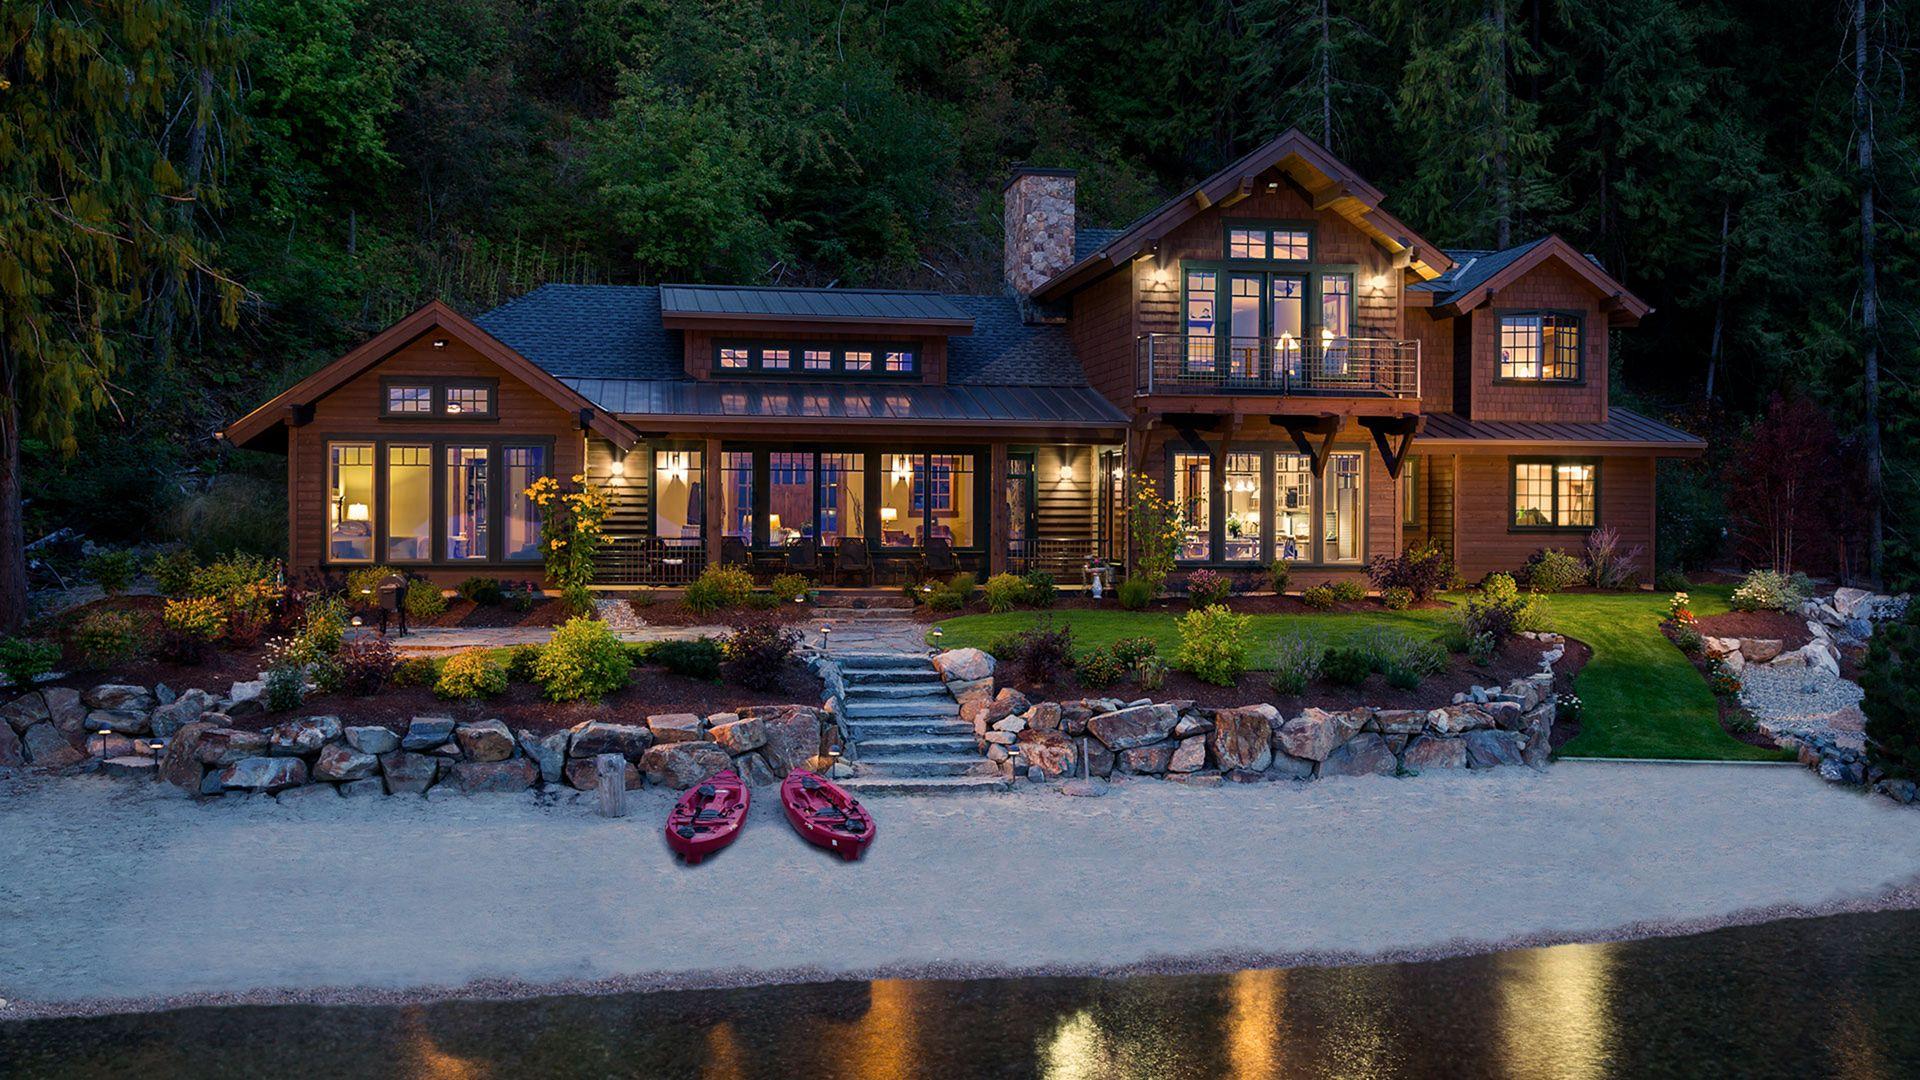 Mountain lake house plans mountain lake house plans for Lake home design ideas